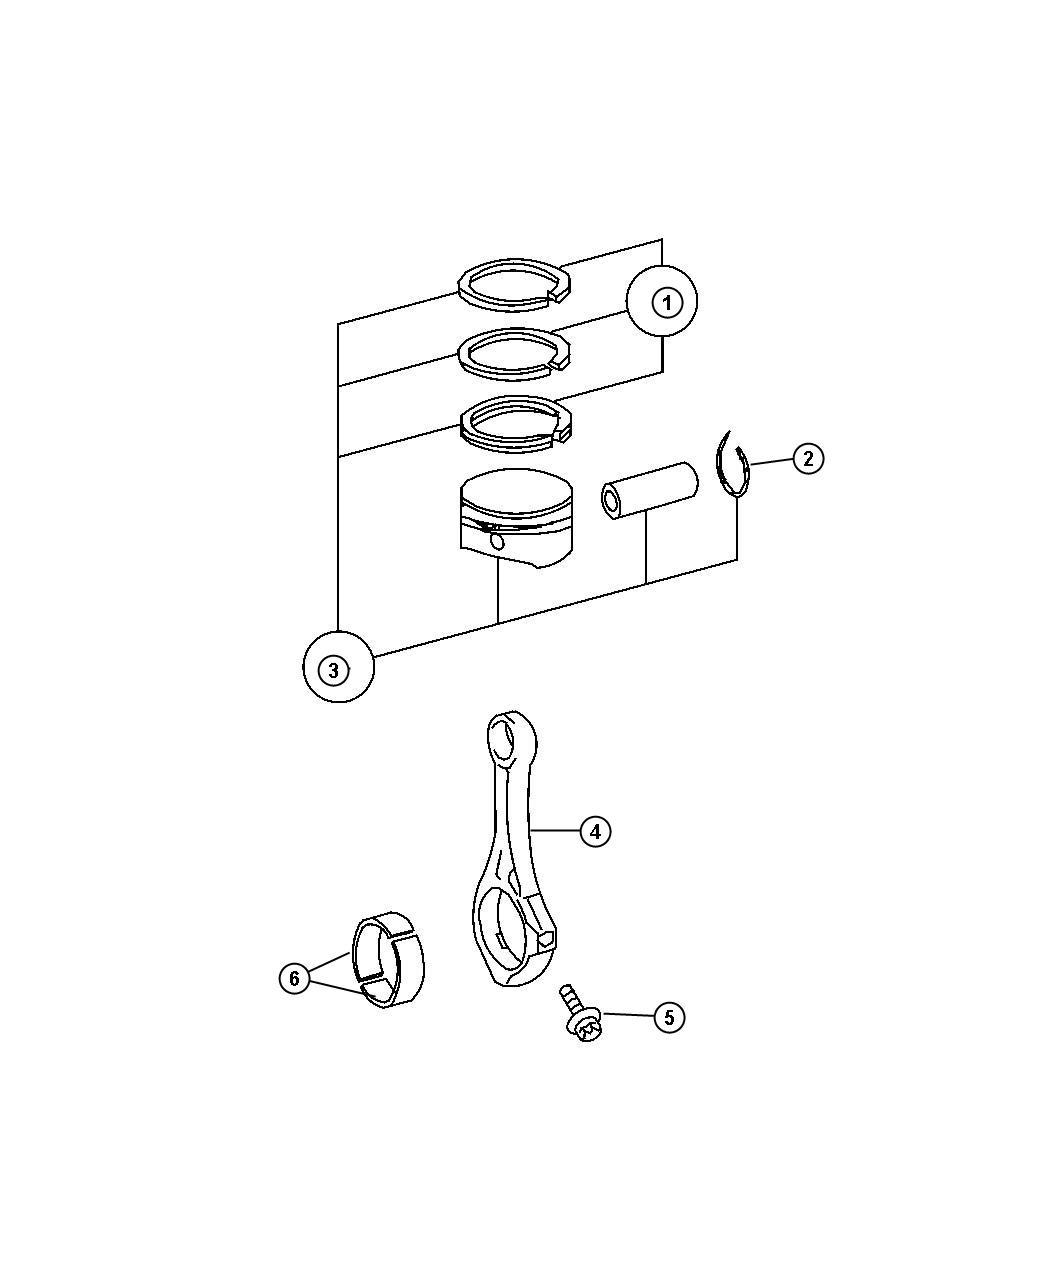 Dodge Sprinter Bearing Connecting Rod Parts